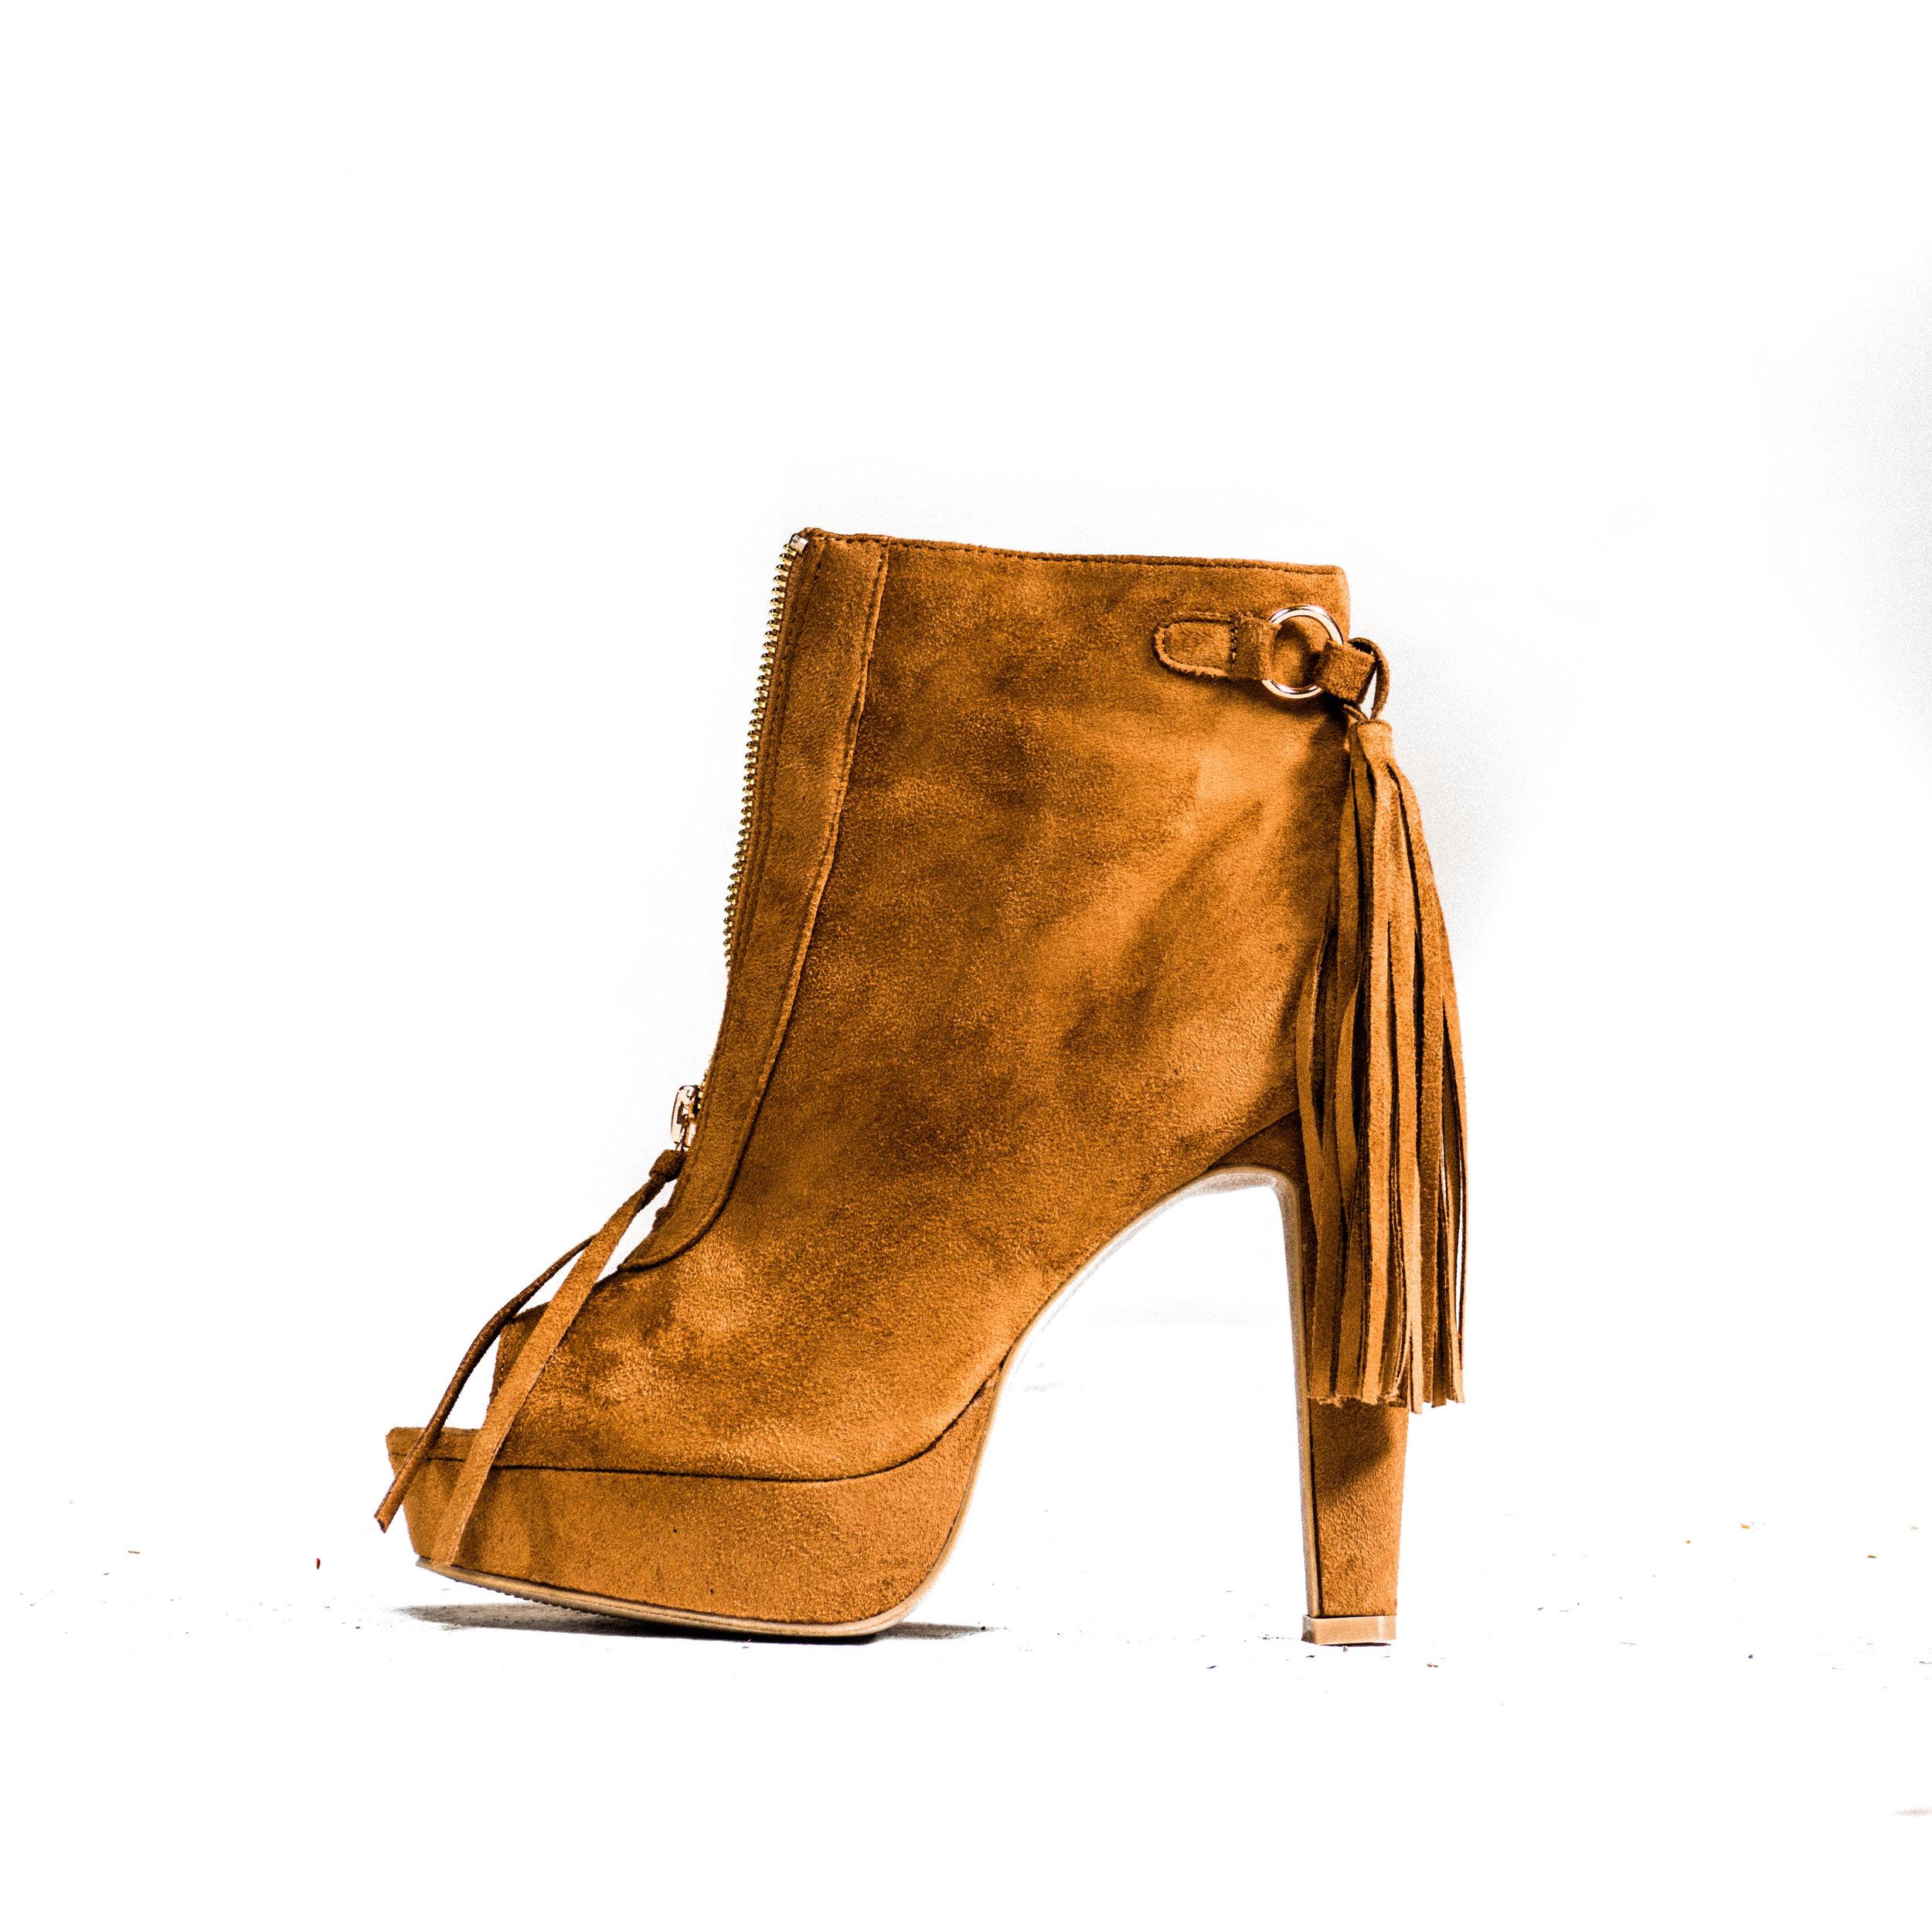 isis clothing - product shots-1580636.jpg